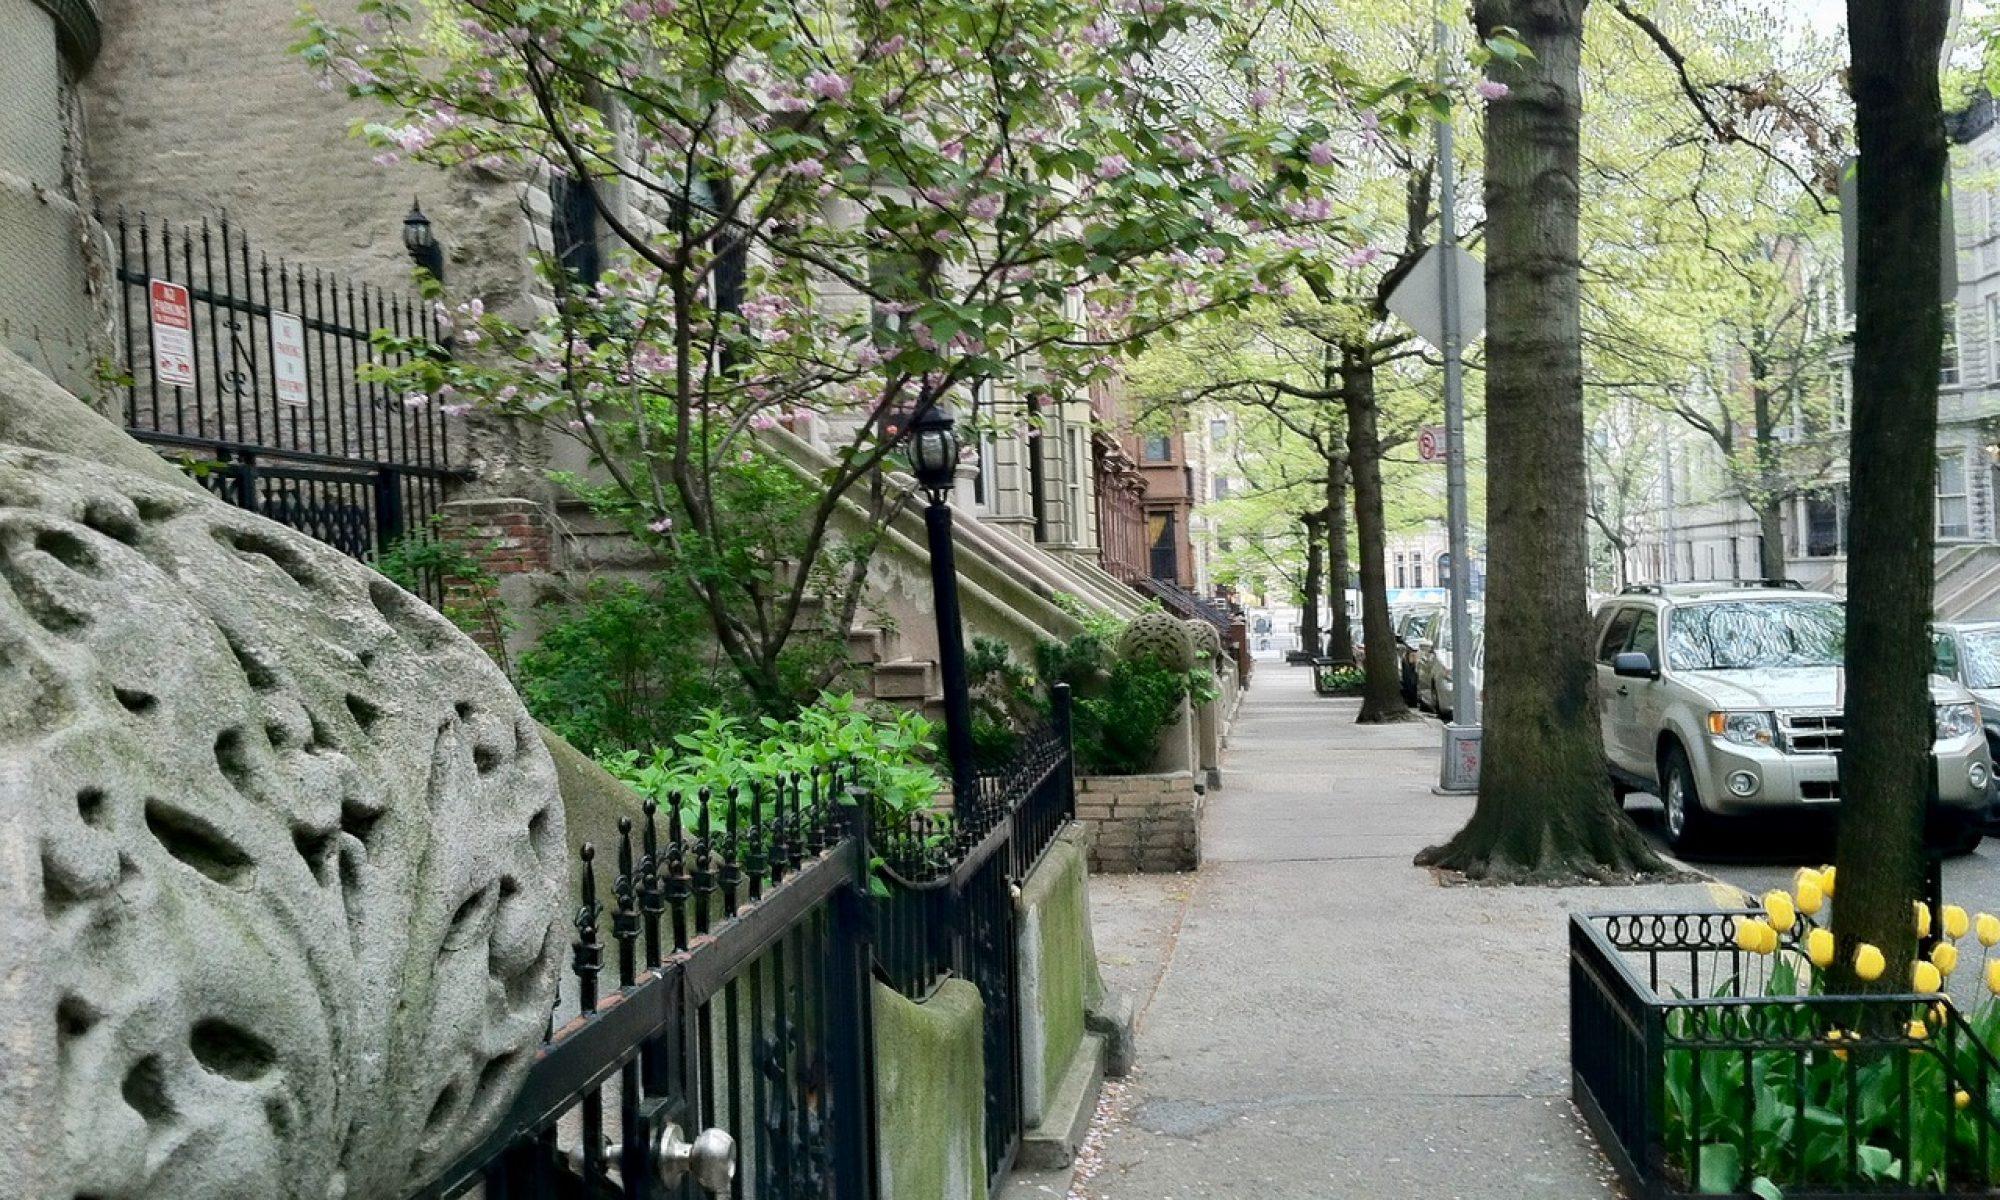 The West 147th Street Block Association